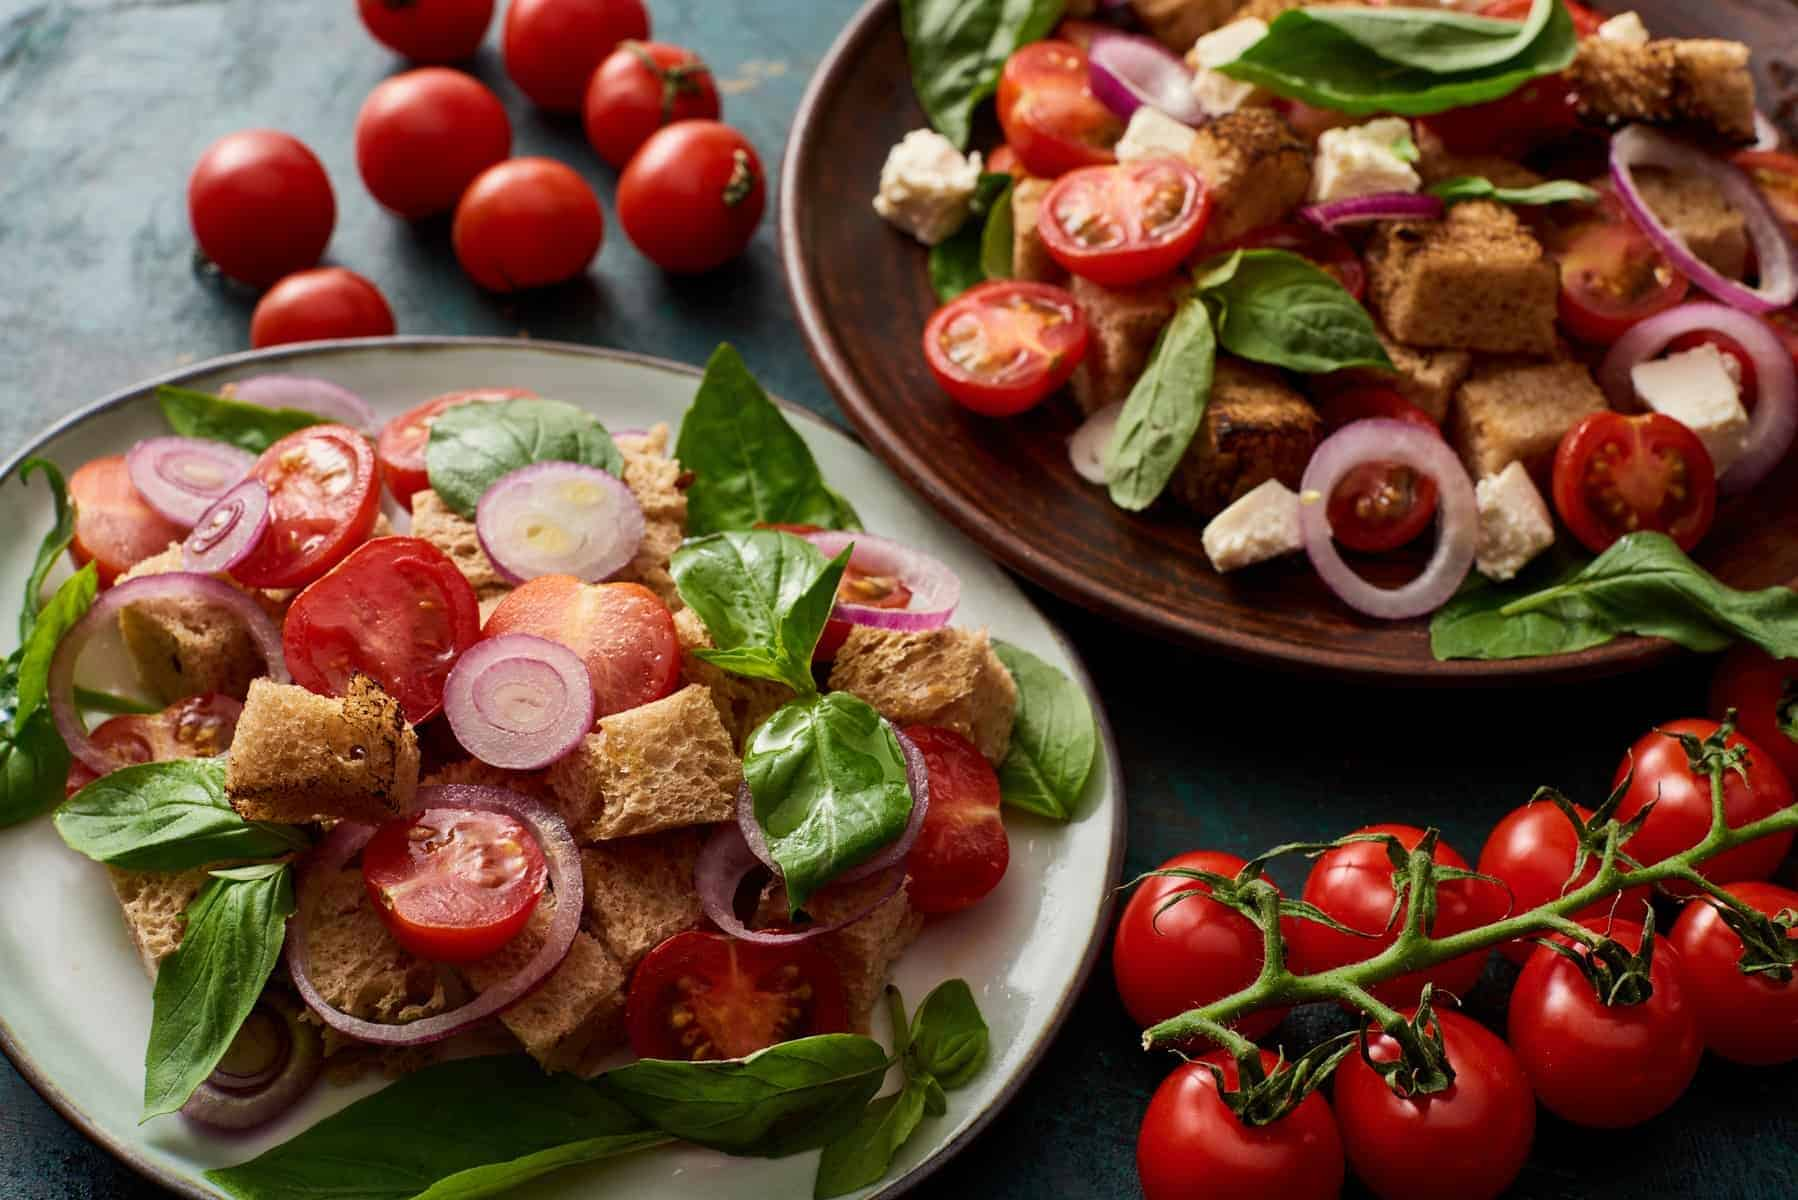 Panzanella, frisk italiensk salat med Croutons/brød